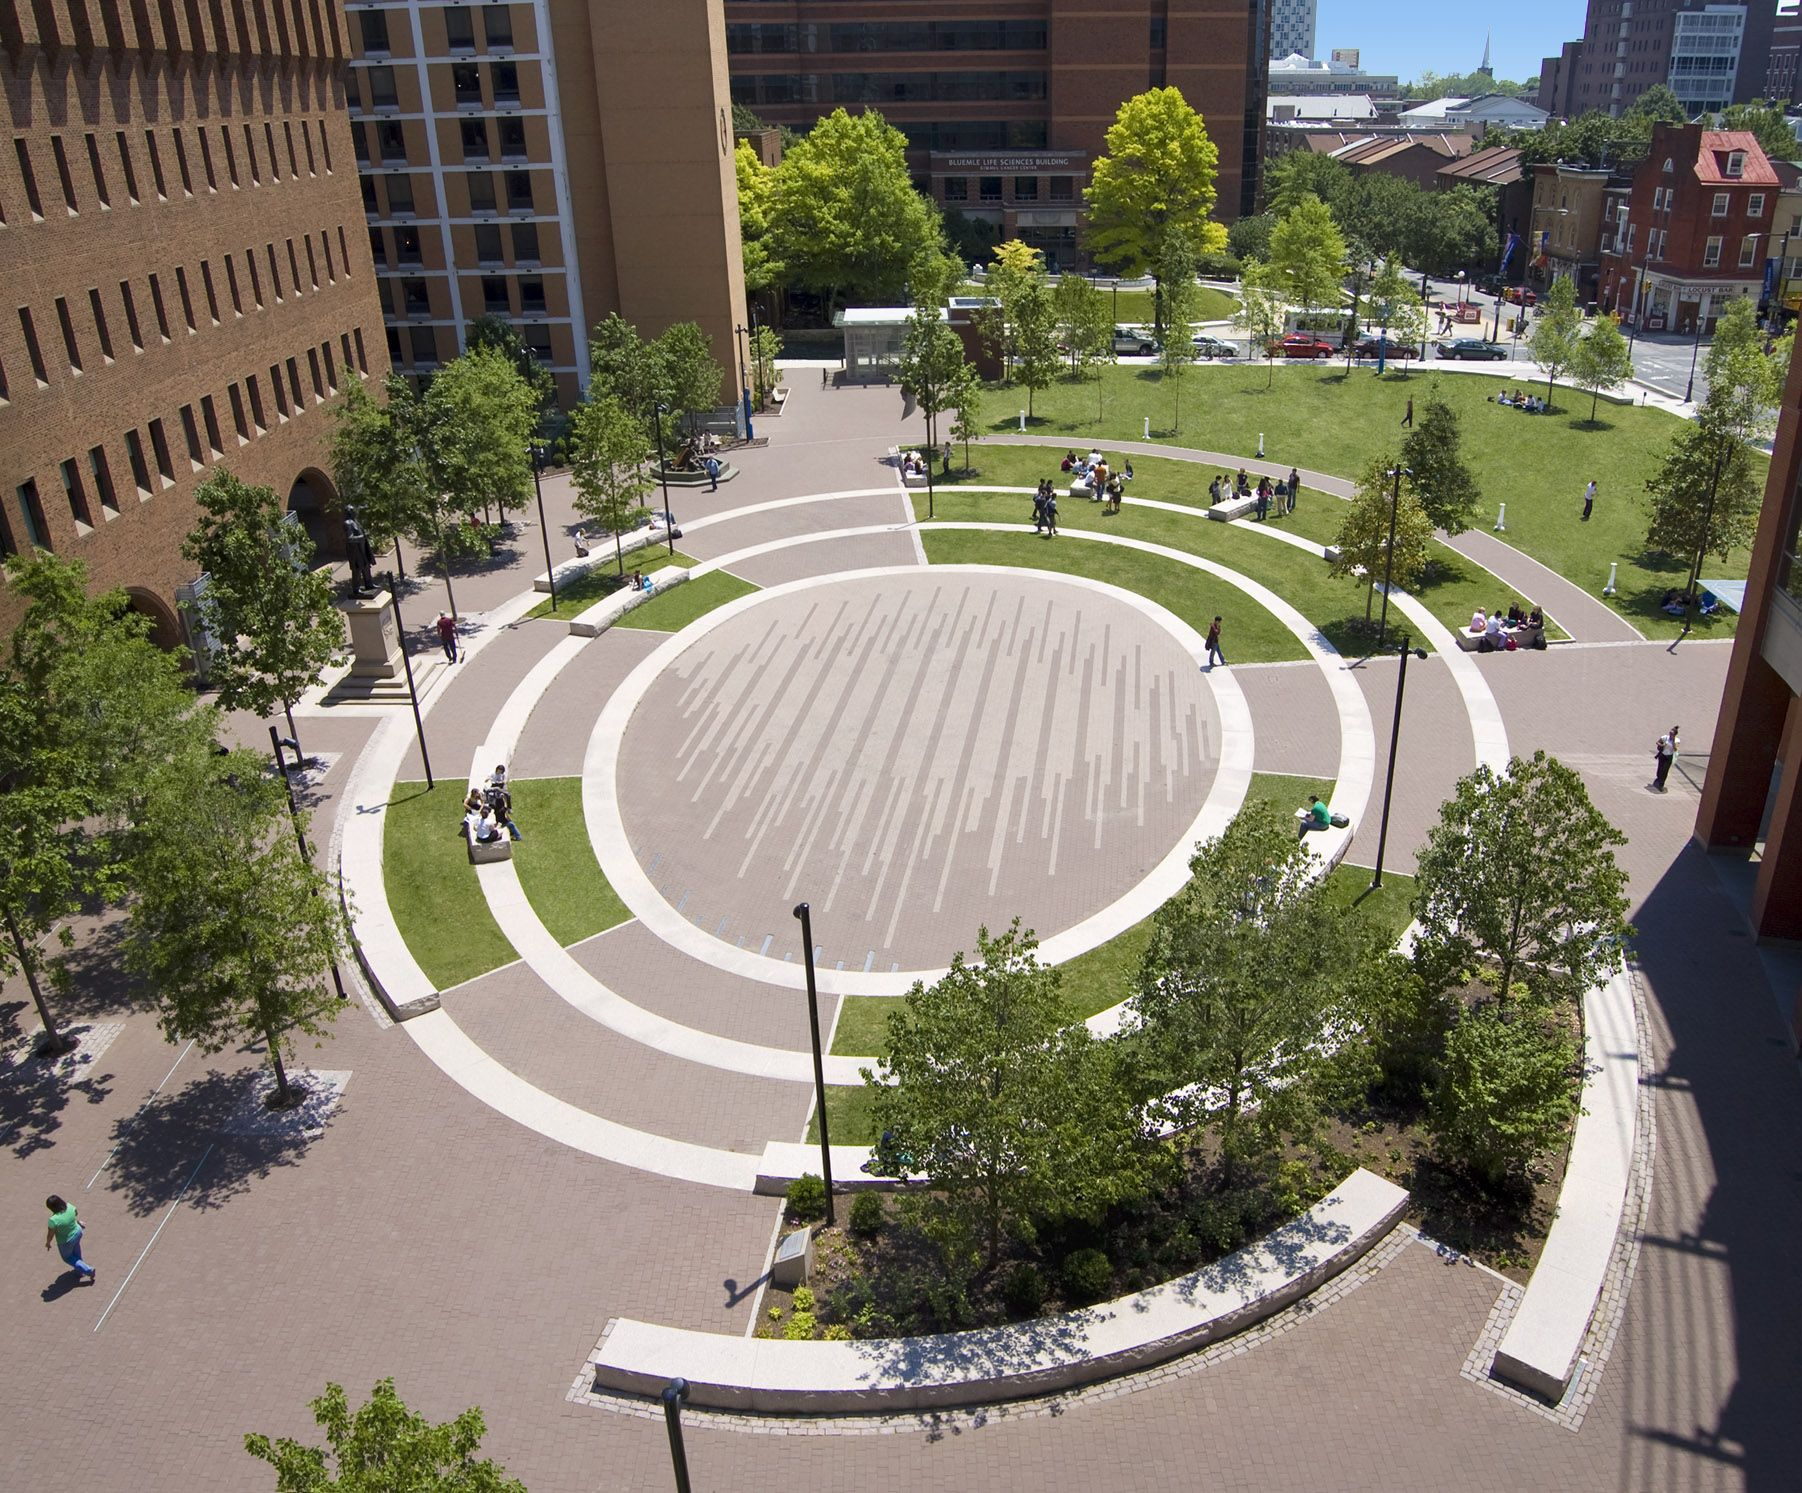 Andropogon Transformed A Bleak Urban Plaza In Center City